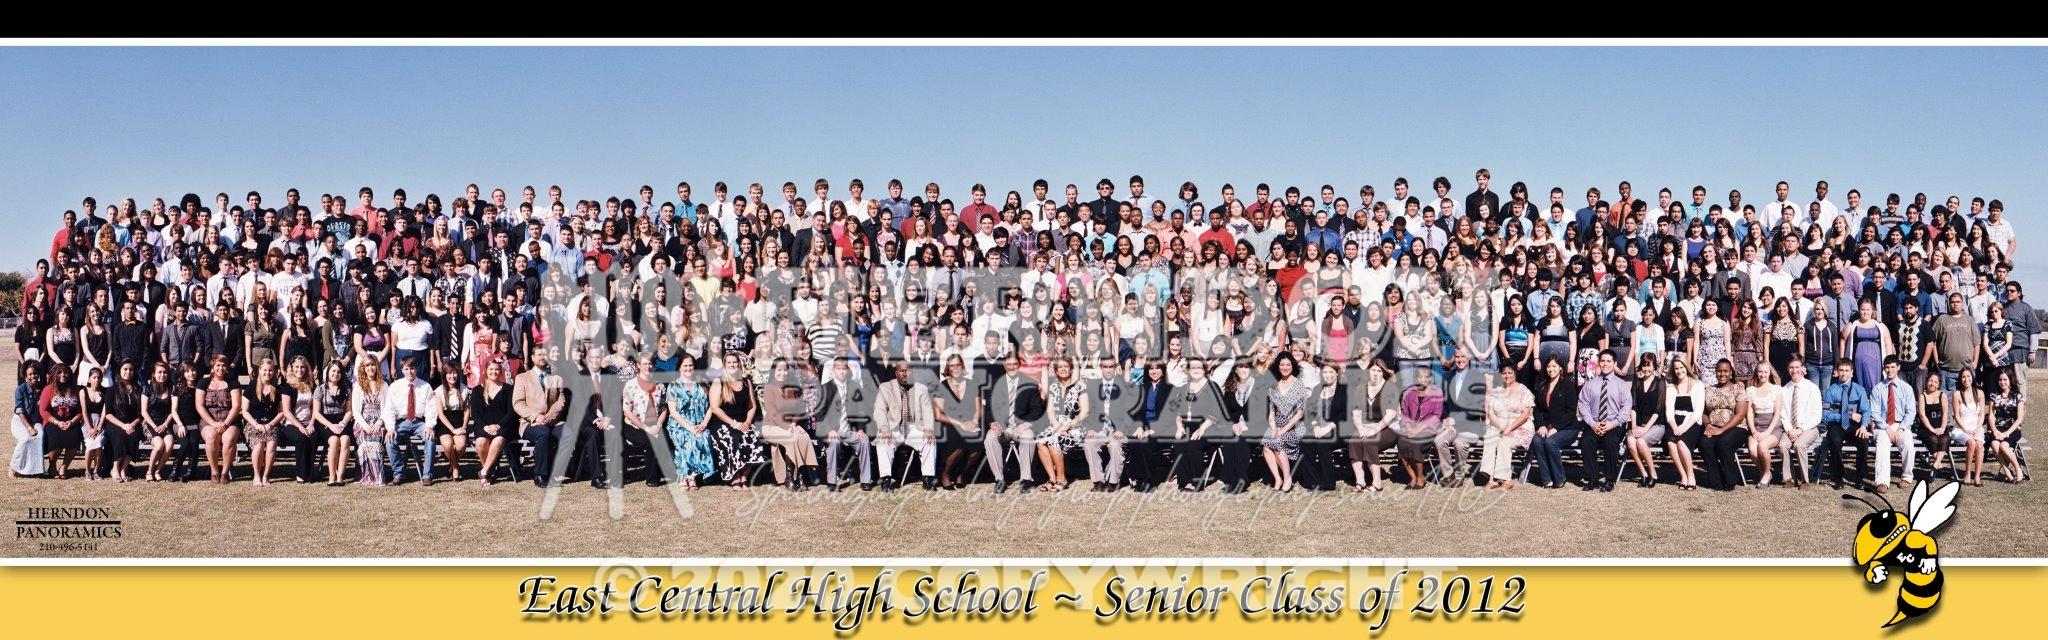 East-Central-High-School